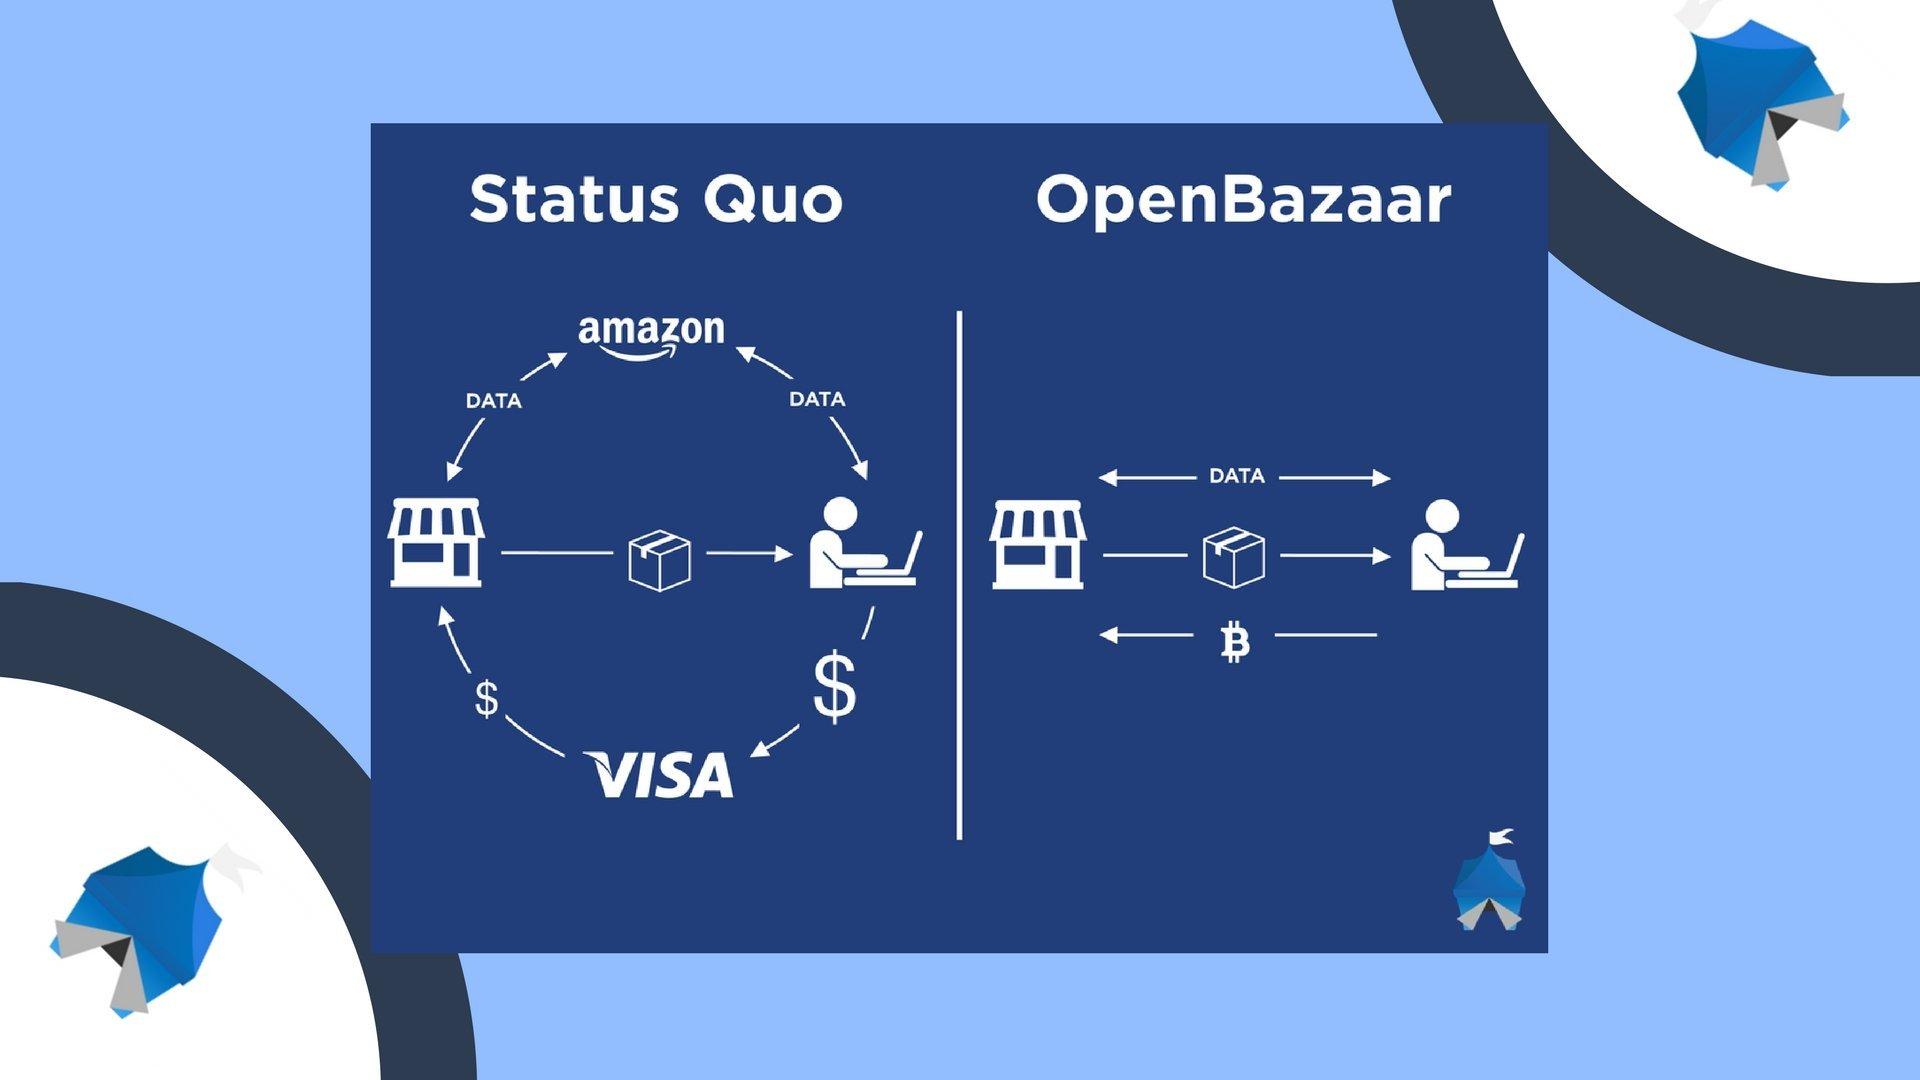 openbazaar & peerhub - marketplaces for cryptocurrency